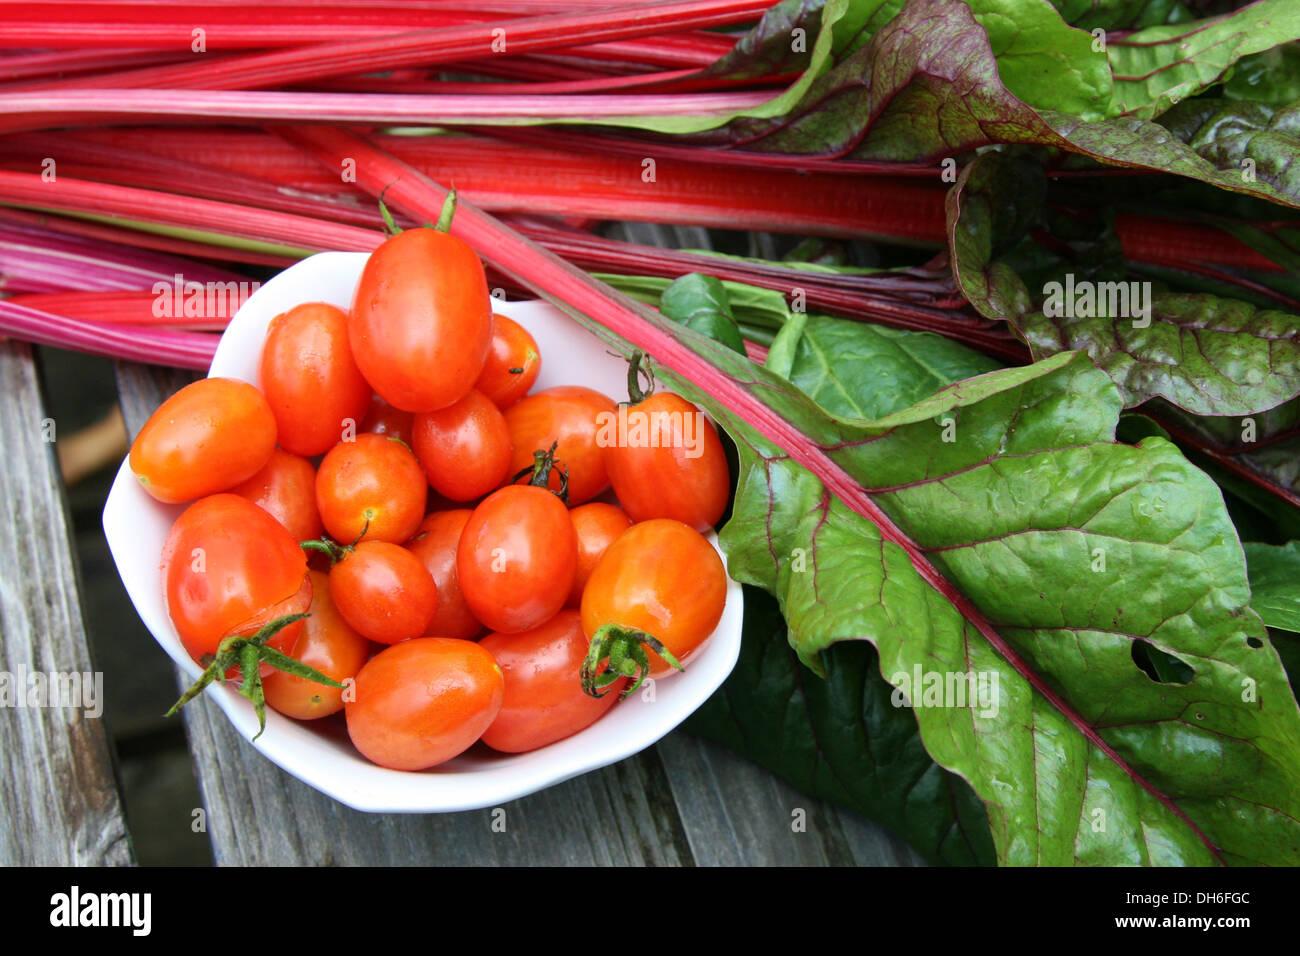 Cherry tomatoes and swiss chard - Stock Image